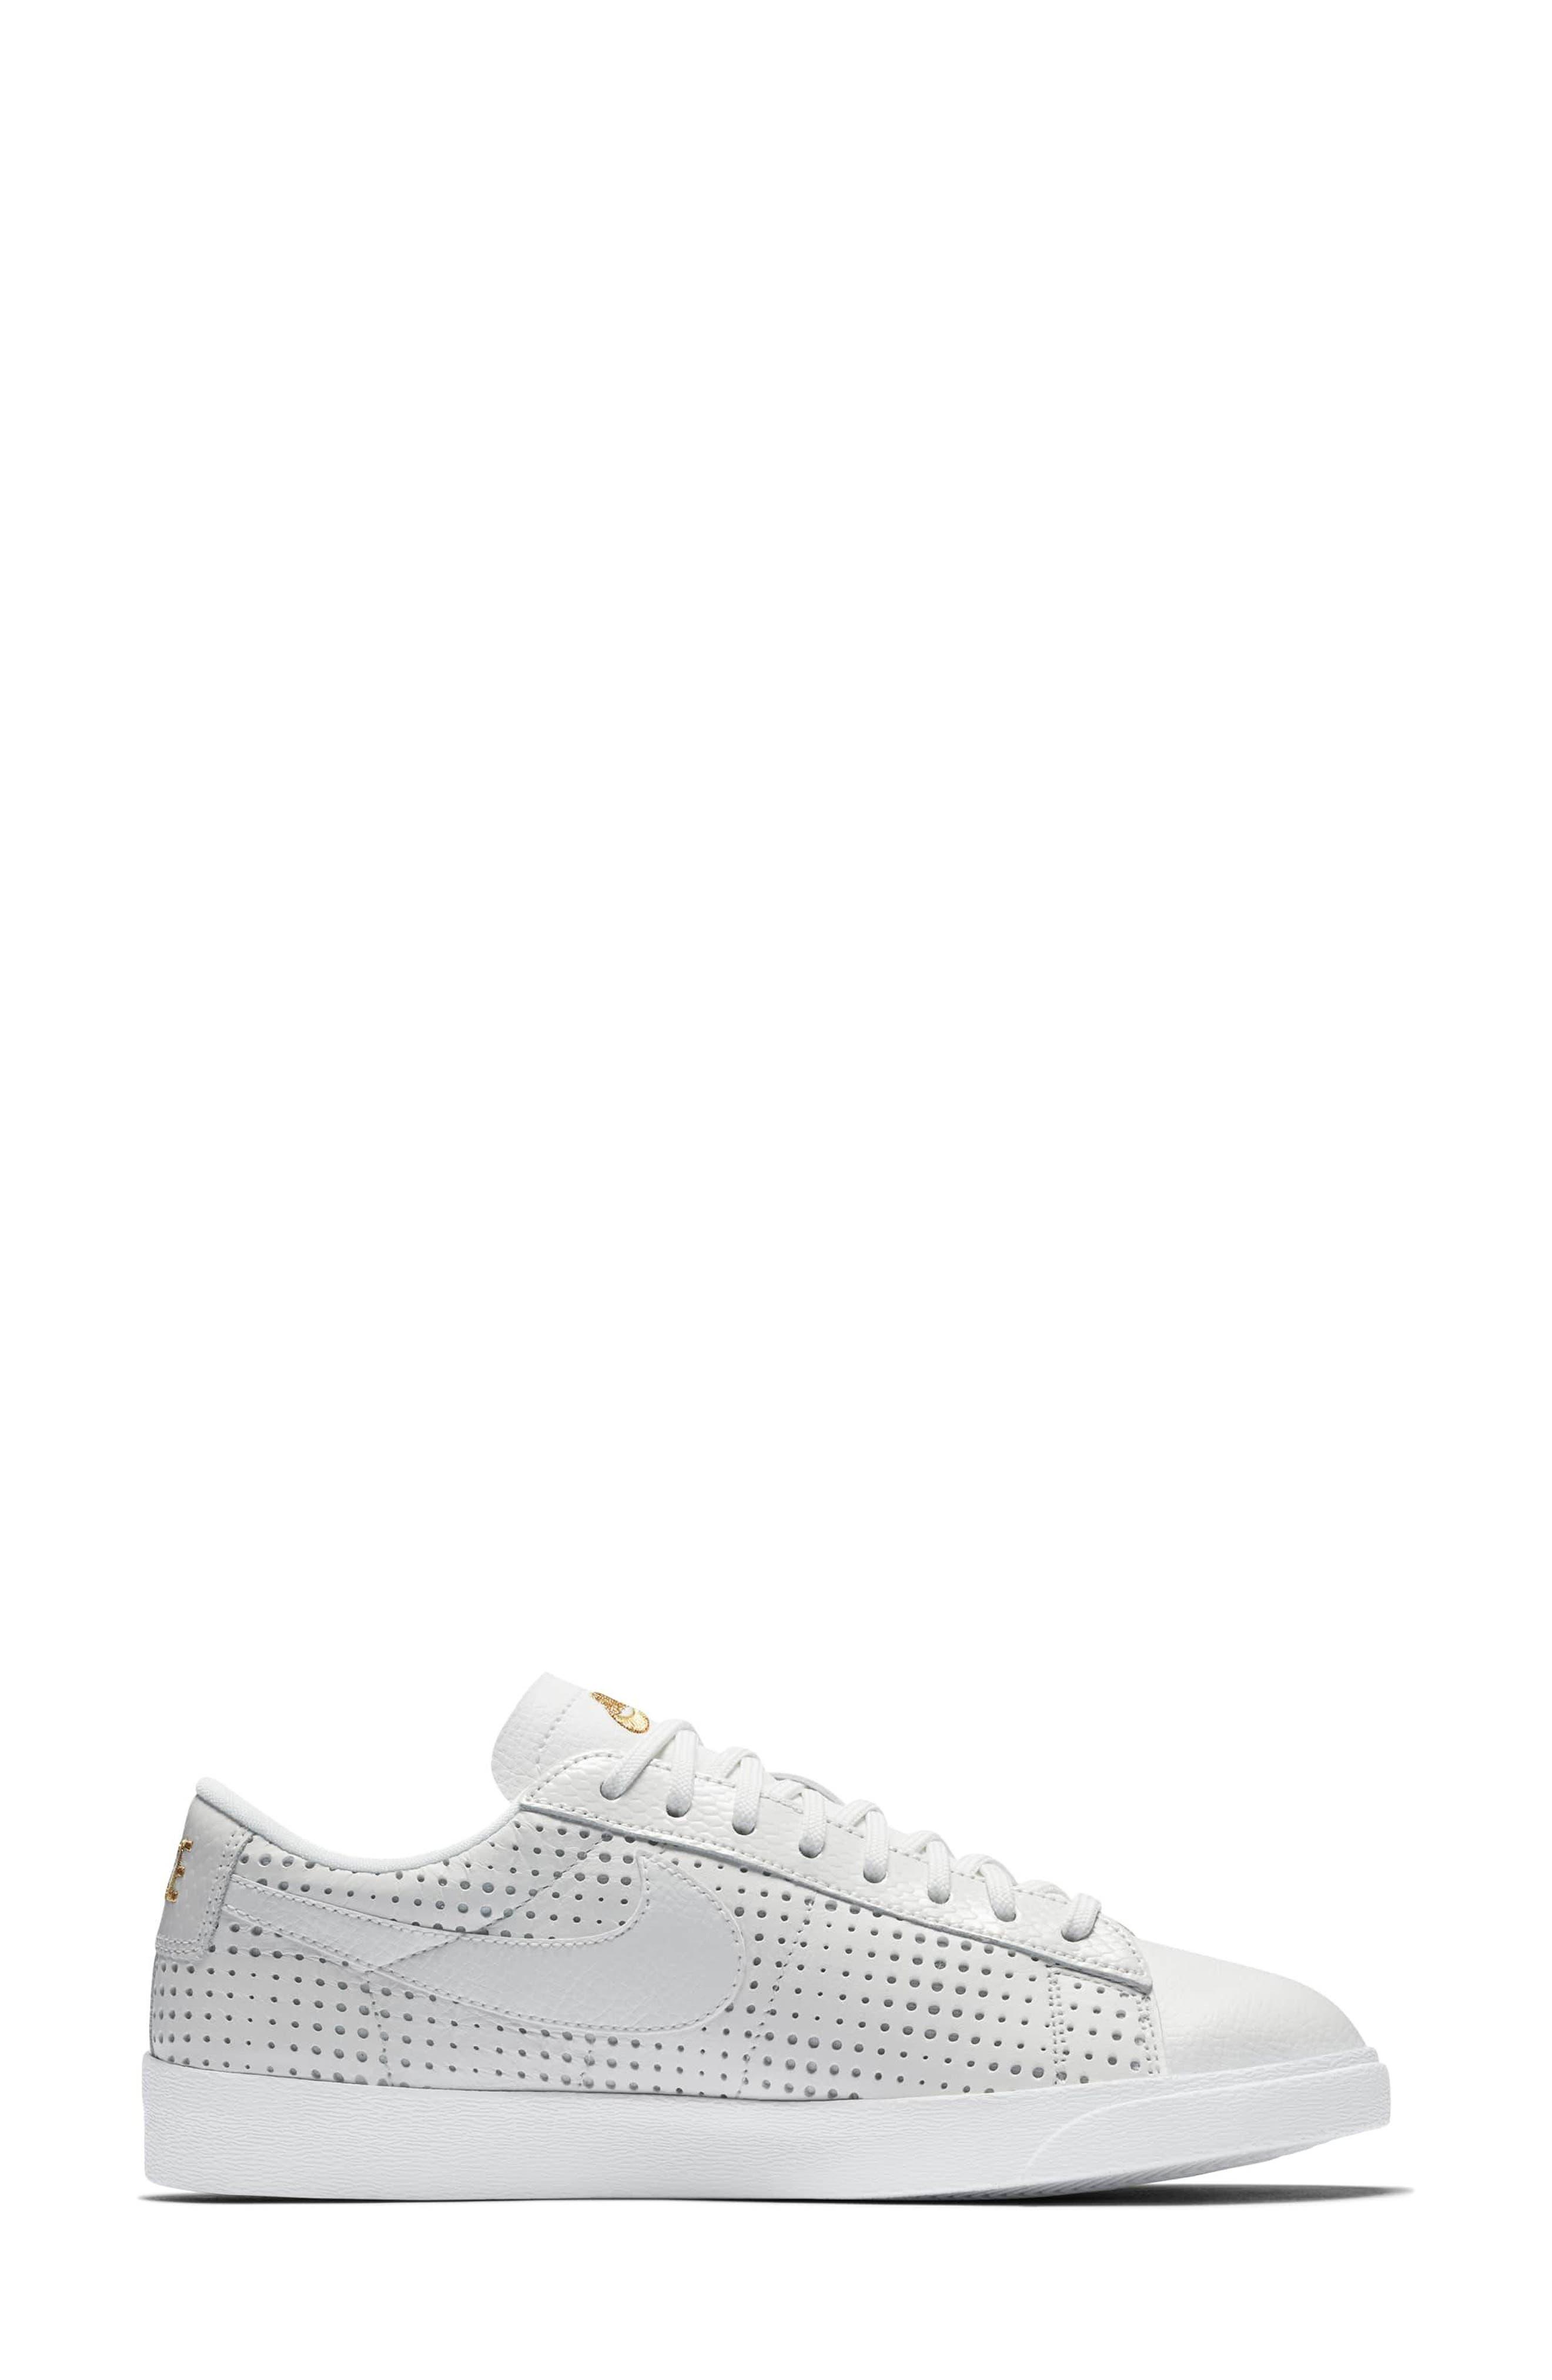 Alternate Image 1 Selected - Nike Blazer Low Top Sneaker SE (Women)